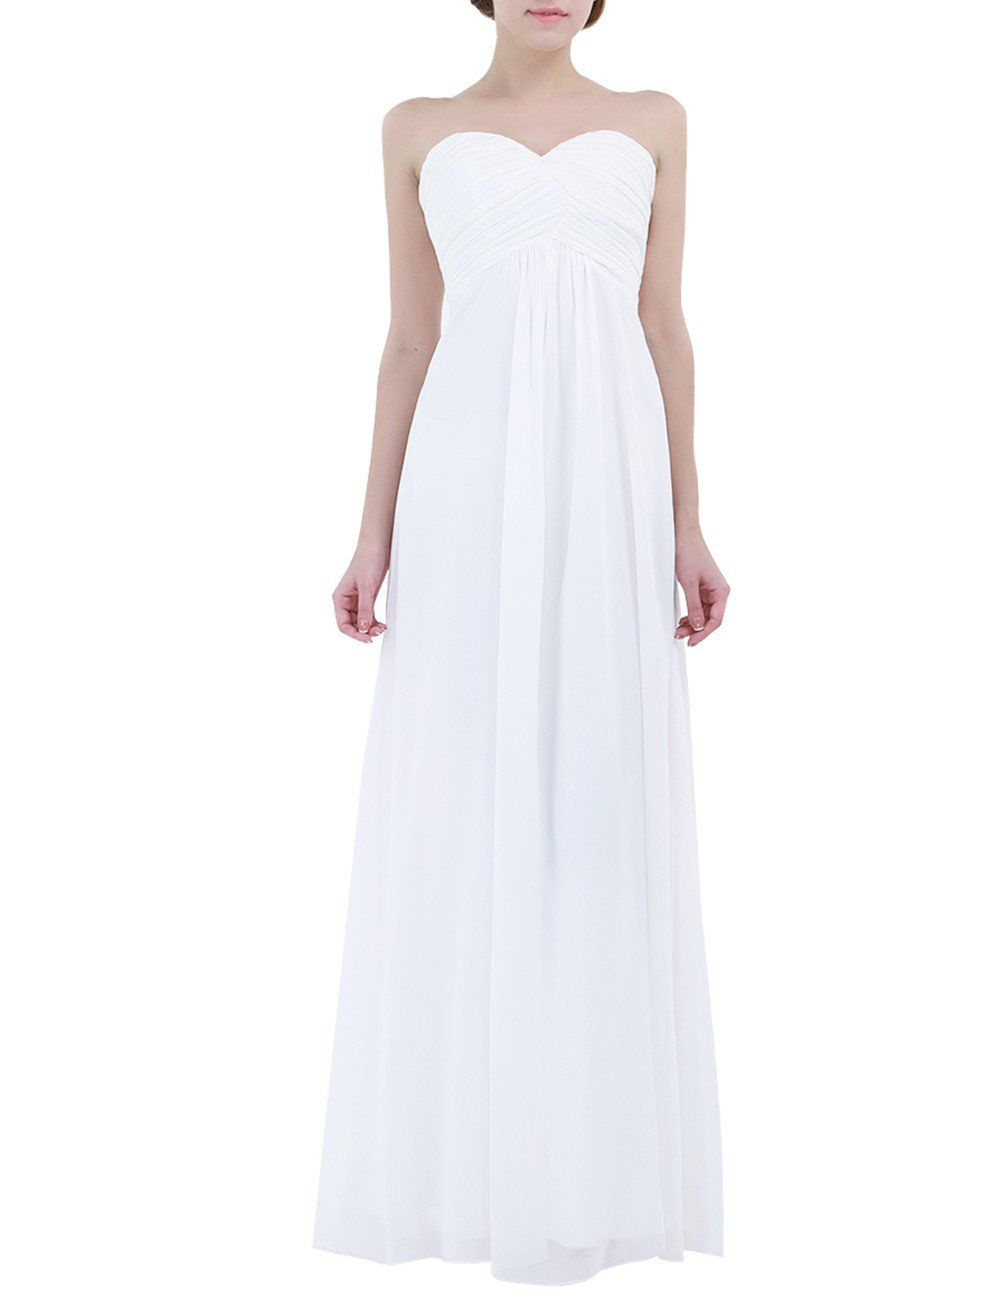 iiniim Vestido Largo Chiffón Elegante Vestido de Ceremonia de Dama de Honor de la Novia Boda